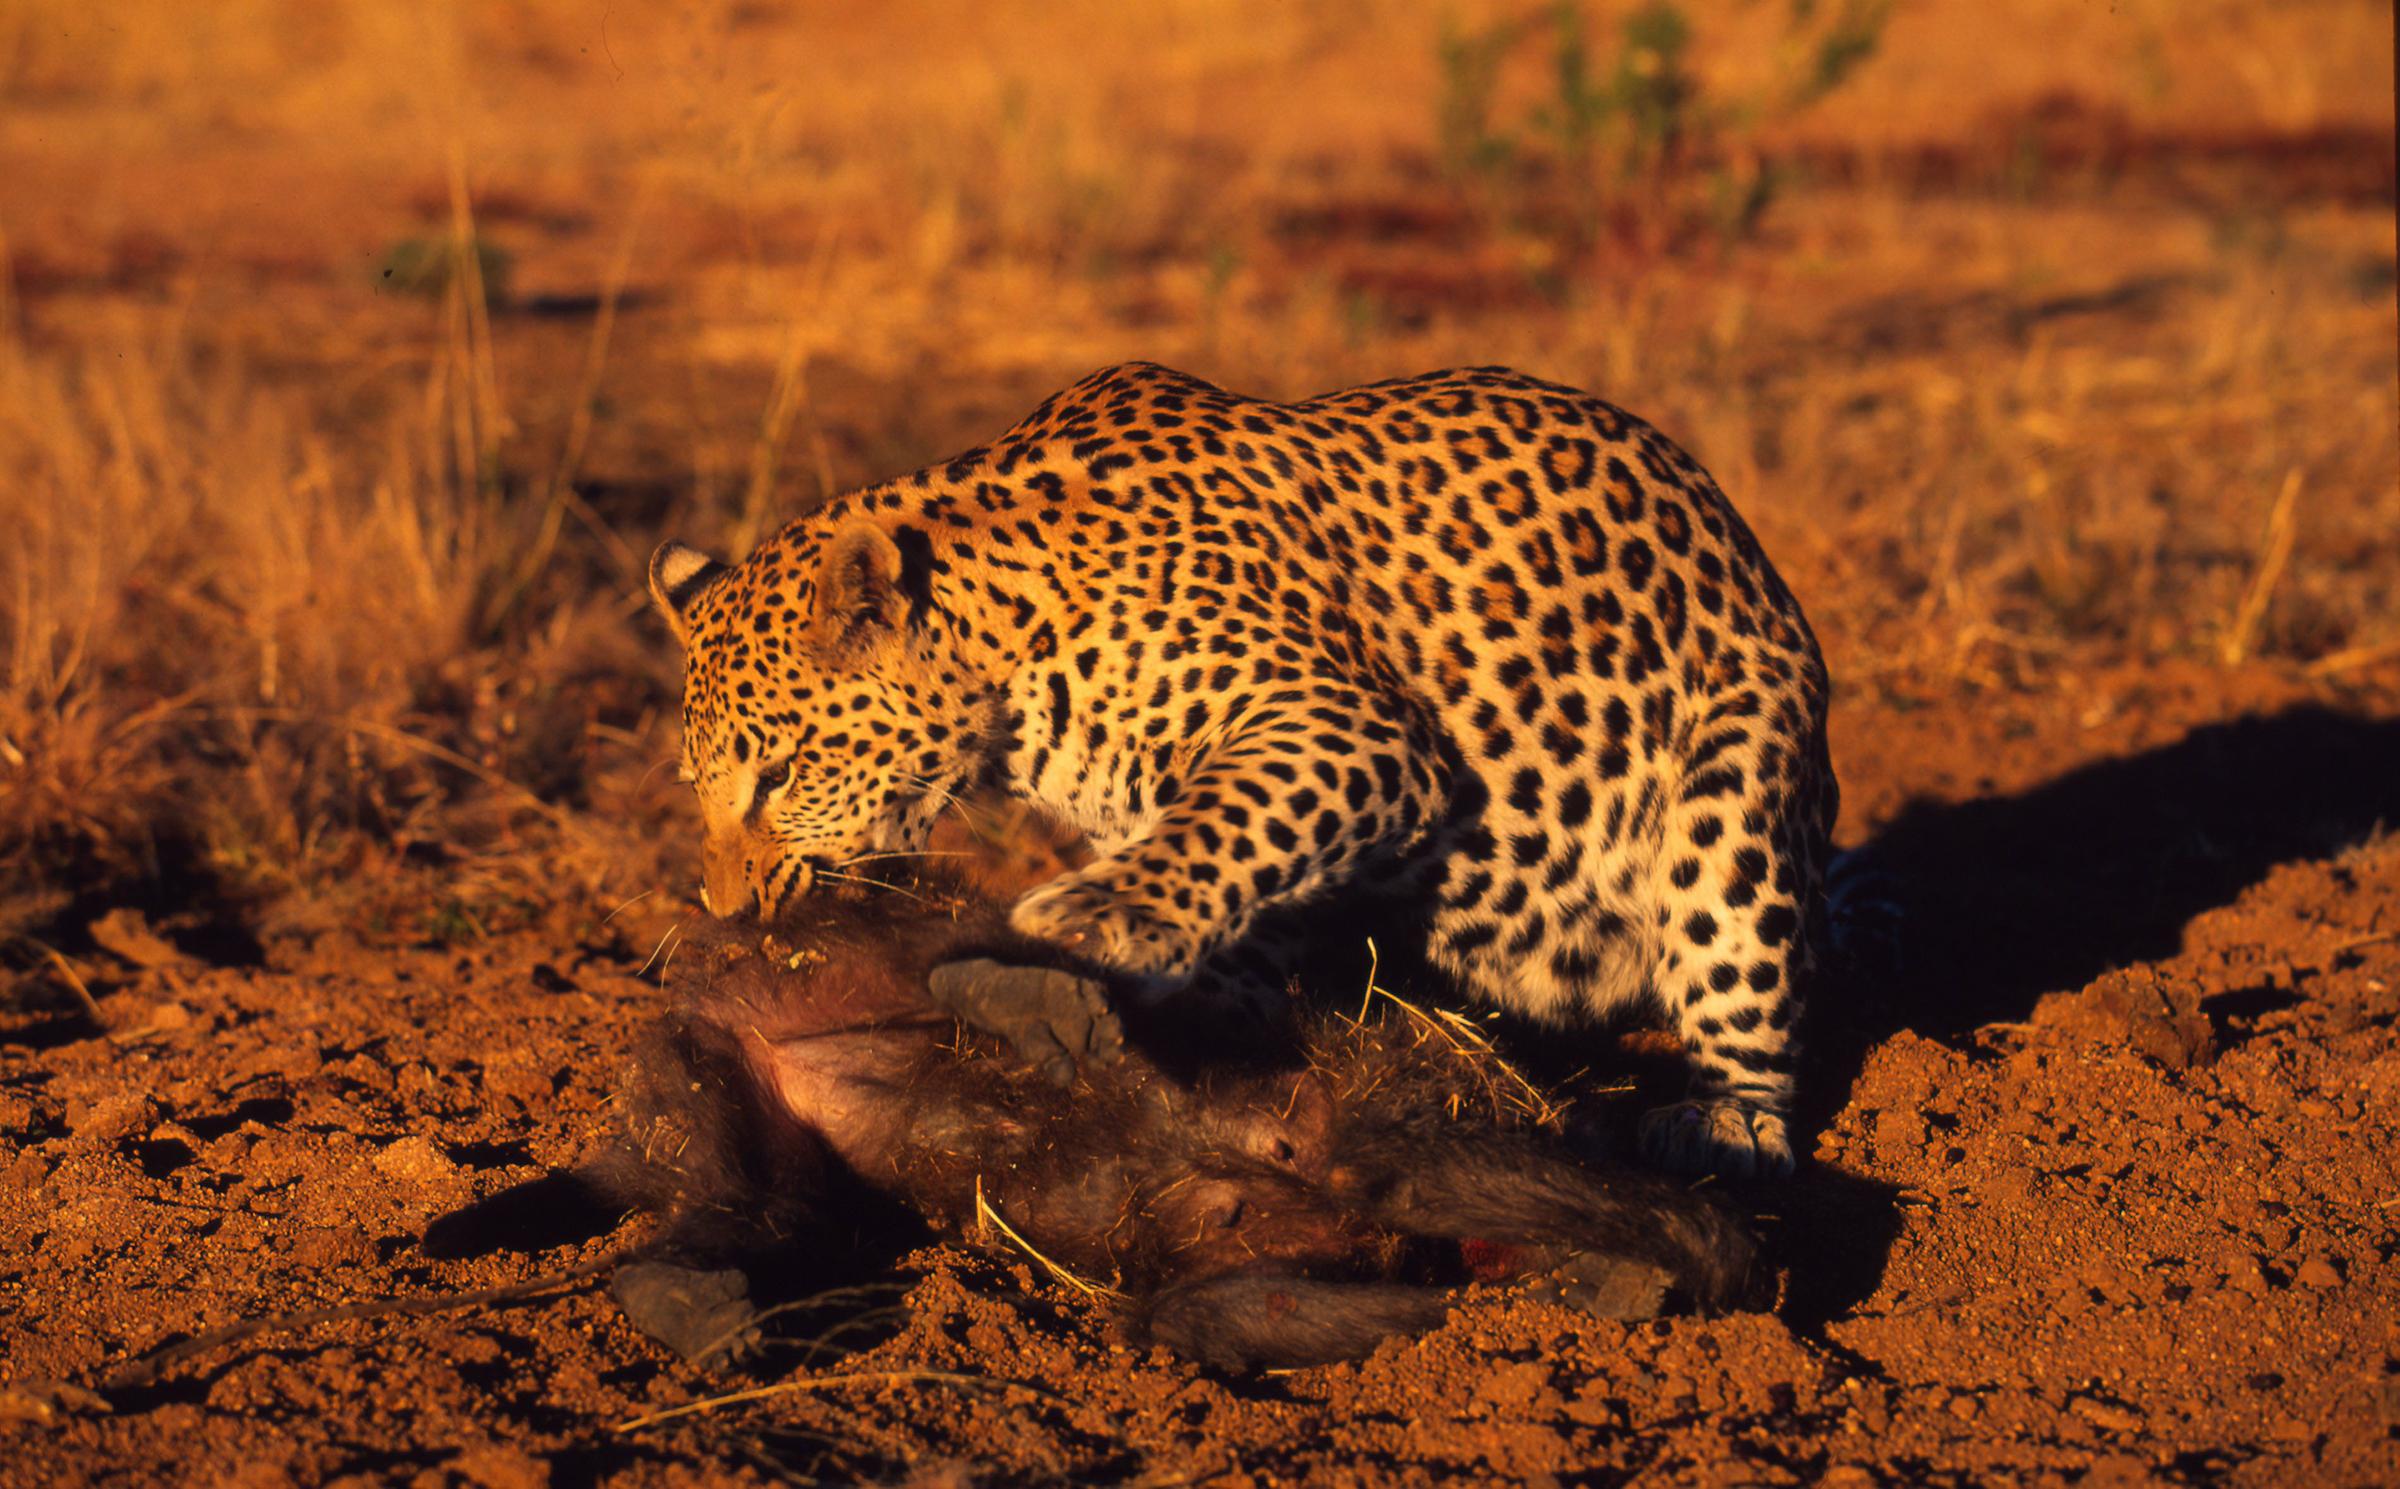 Leopard frisst einen Pavian